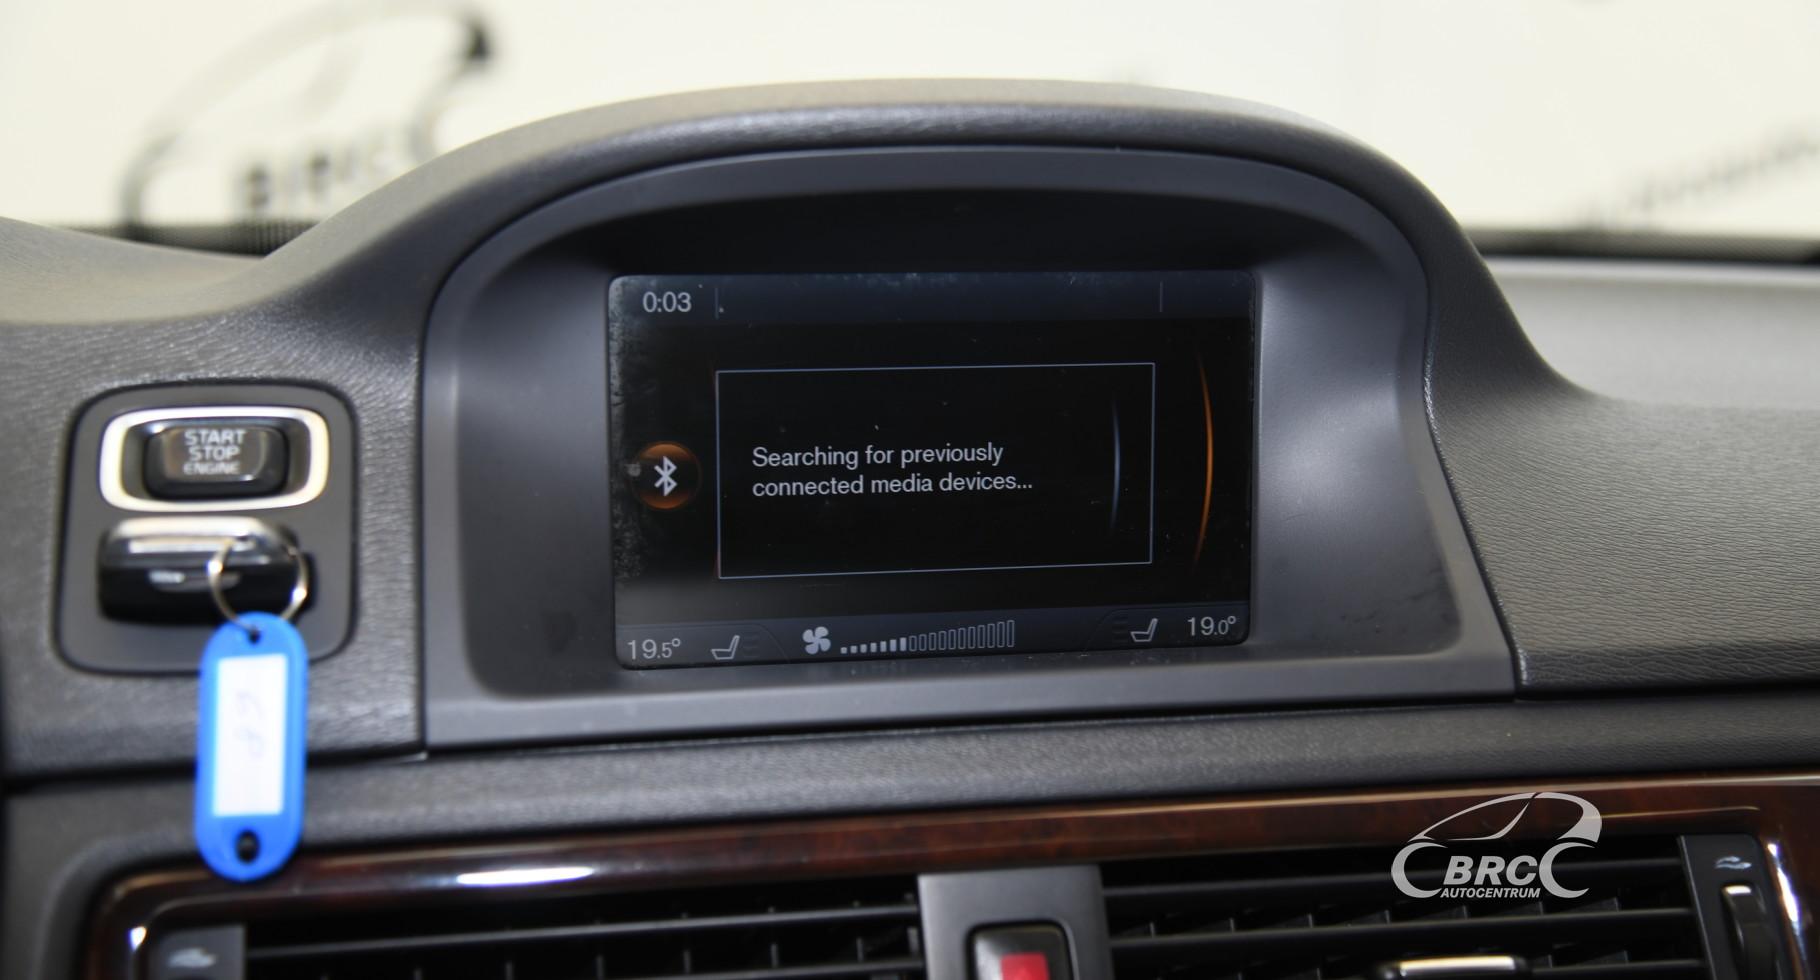 Volvo XC 70 2.0 T5 AWD Automatas